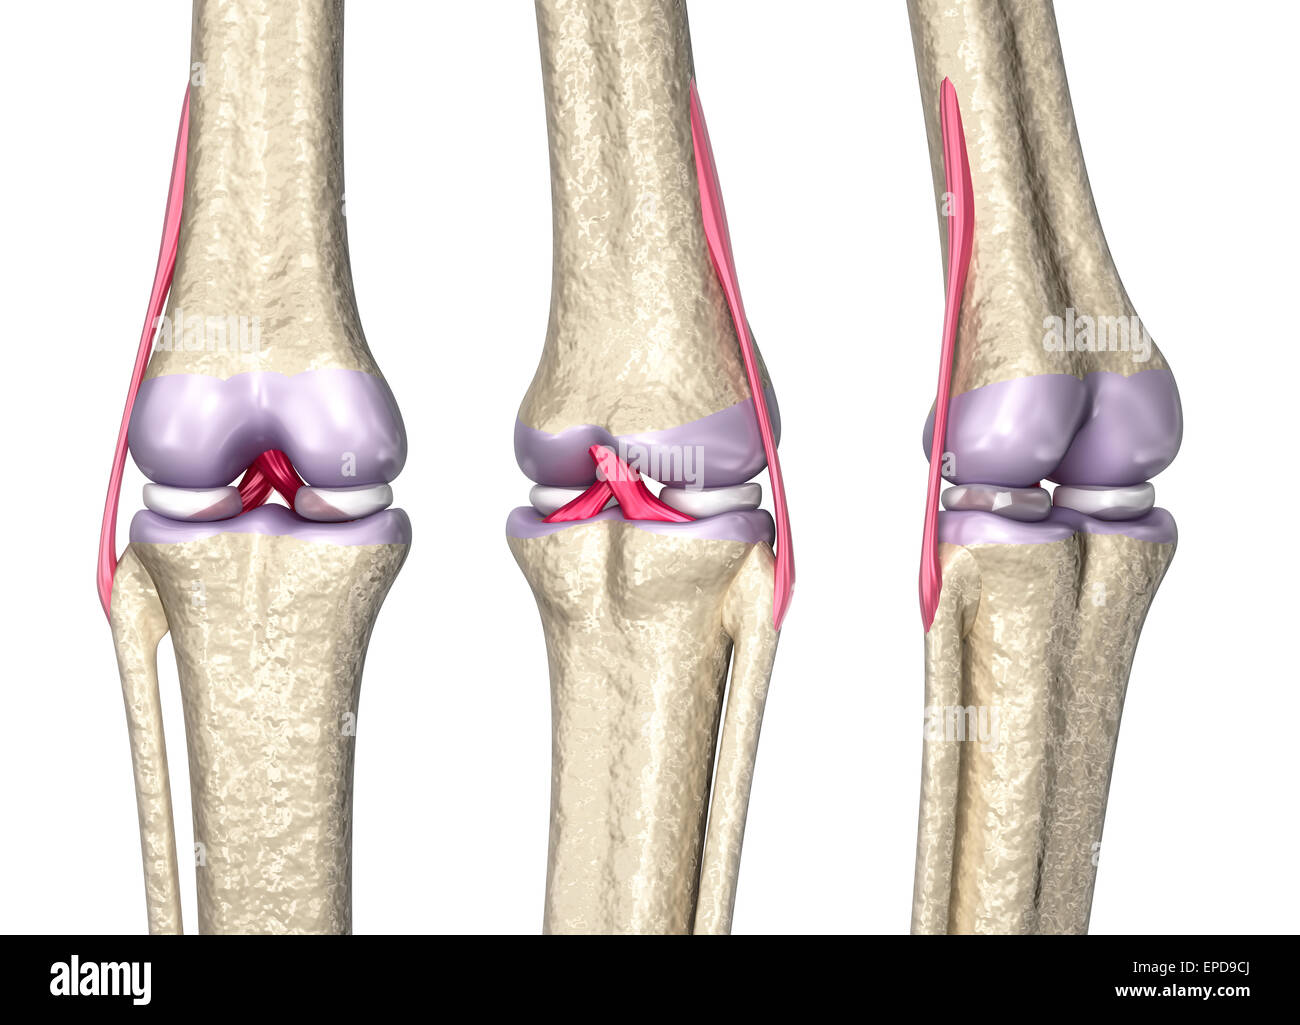 Knie gemeinsamen Anatomie, 3D-Modell Stockfoto, Bild: 82656690 - Alamy